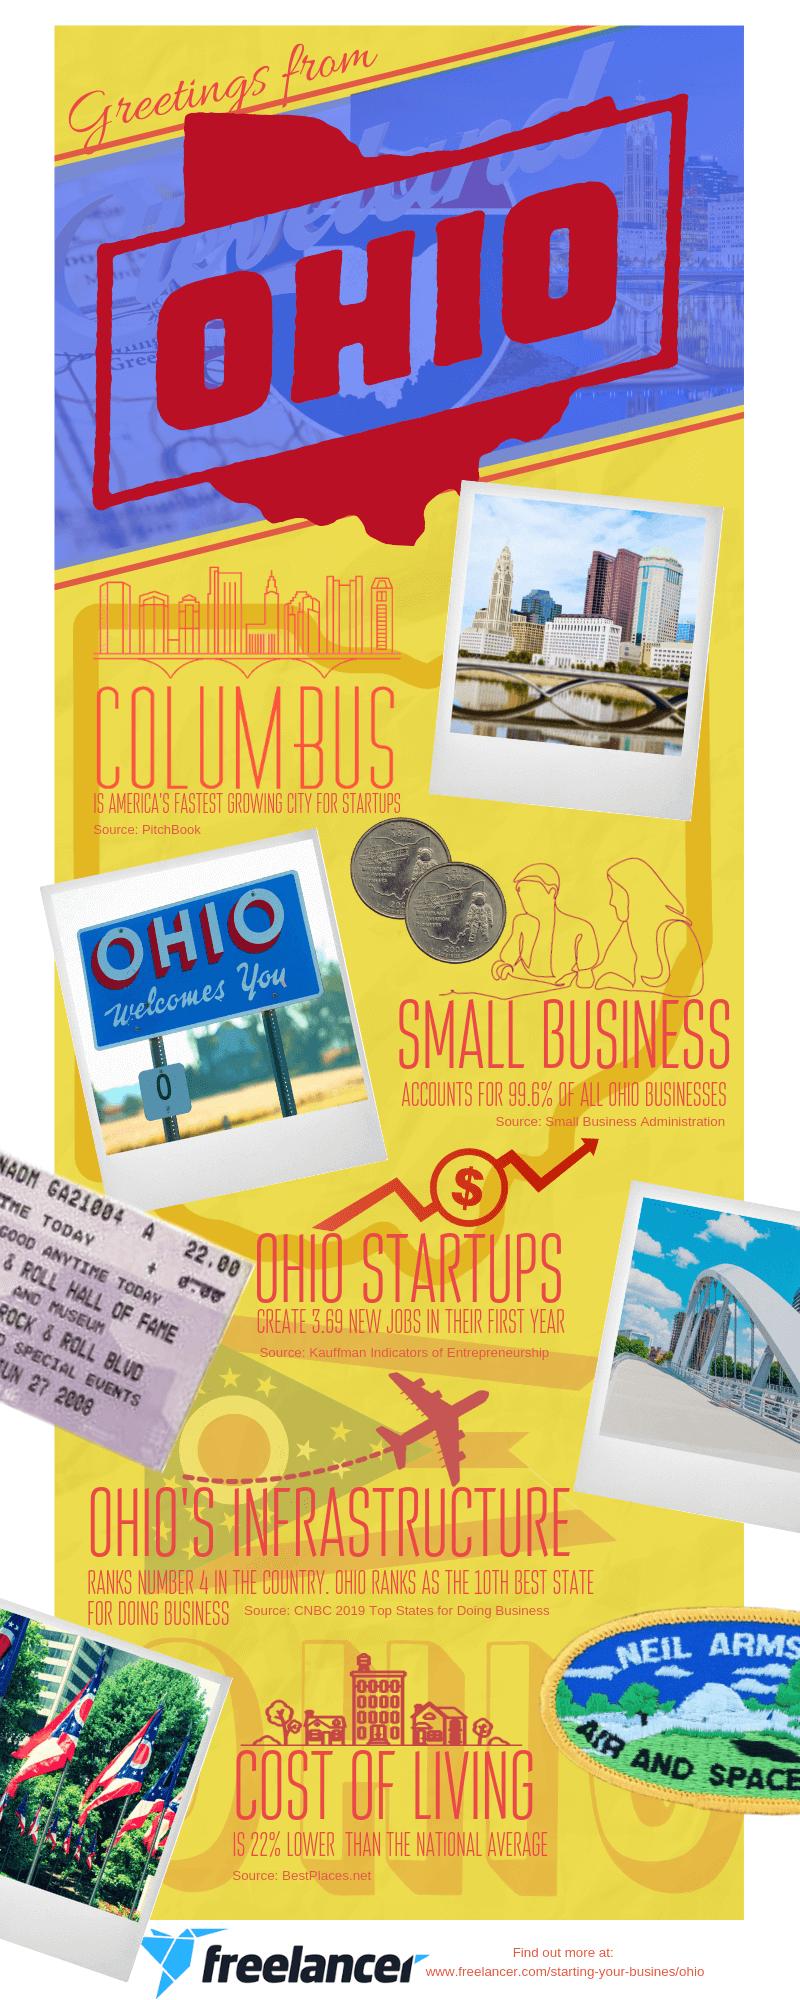 ohio small business startup statistics infographic